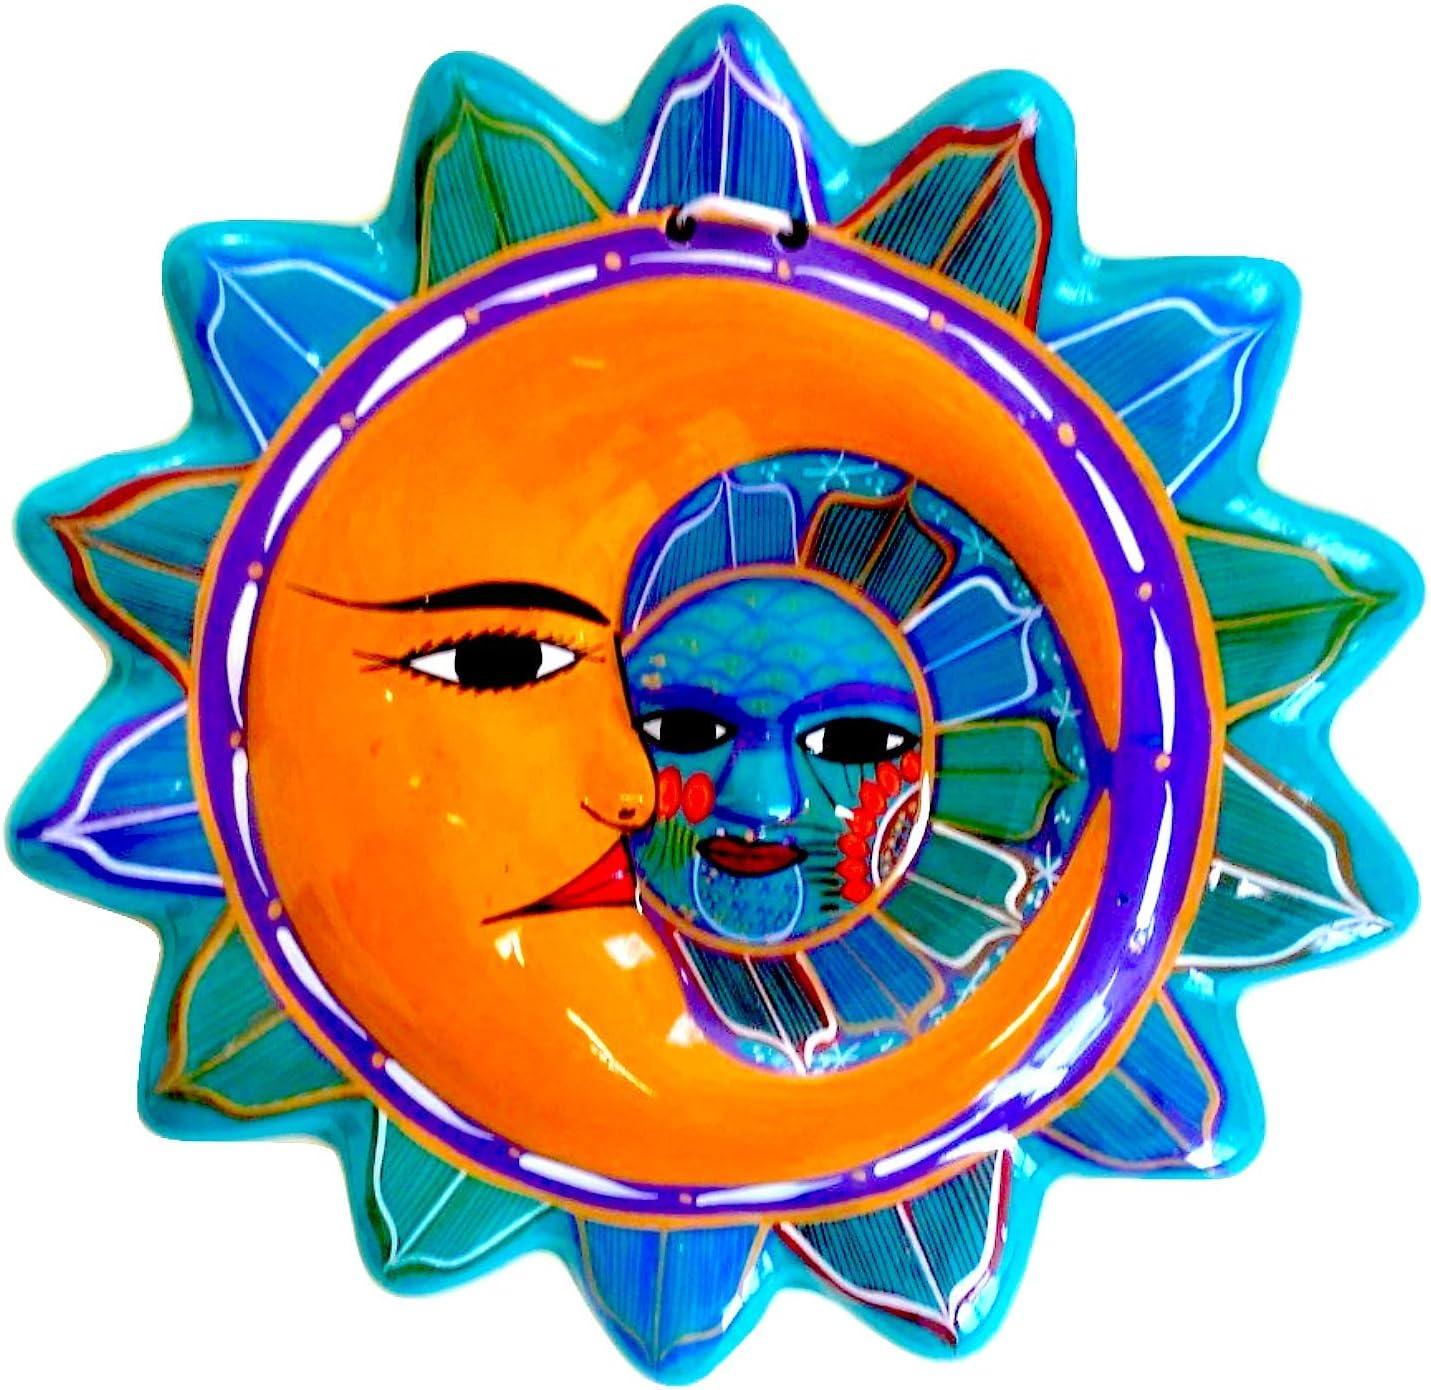 Casa Fiesta Designs Talavera Sun and Moon Face Decor - Ceramic Eclipse Mexican Home Decor - Hand Painted in Mexico - Wall Decoration - Eclipse